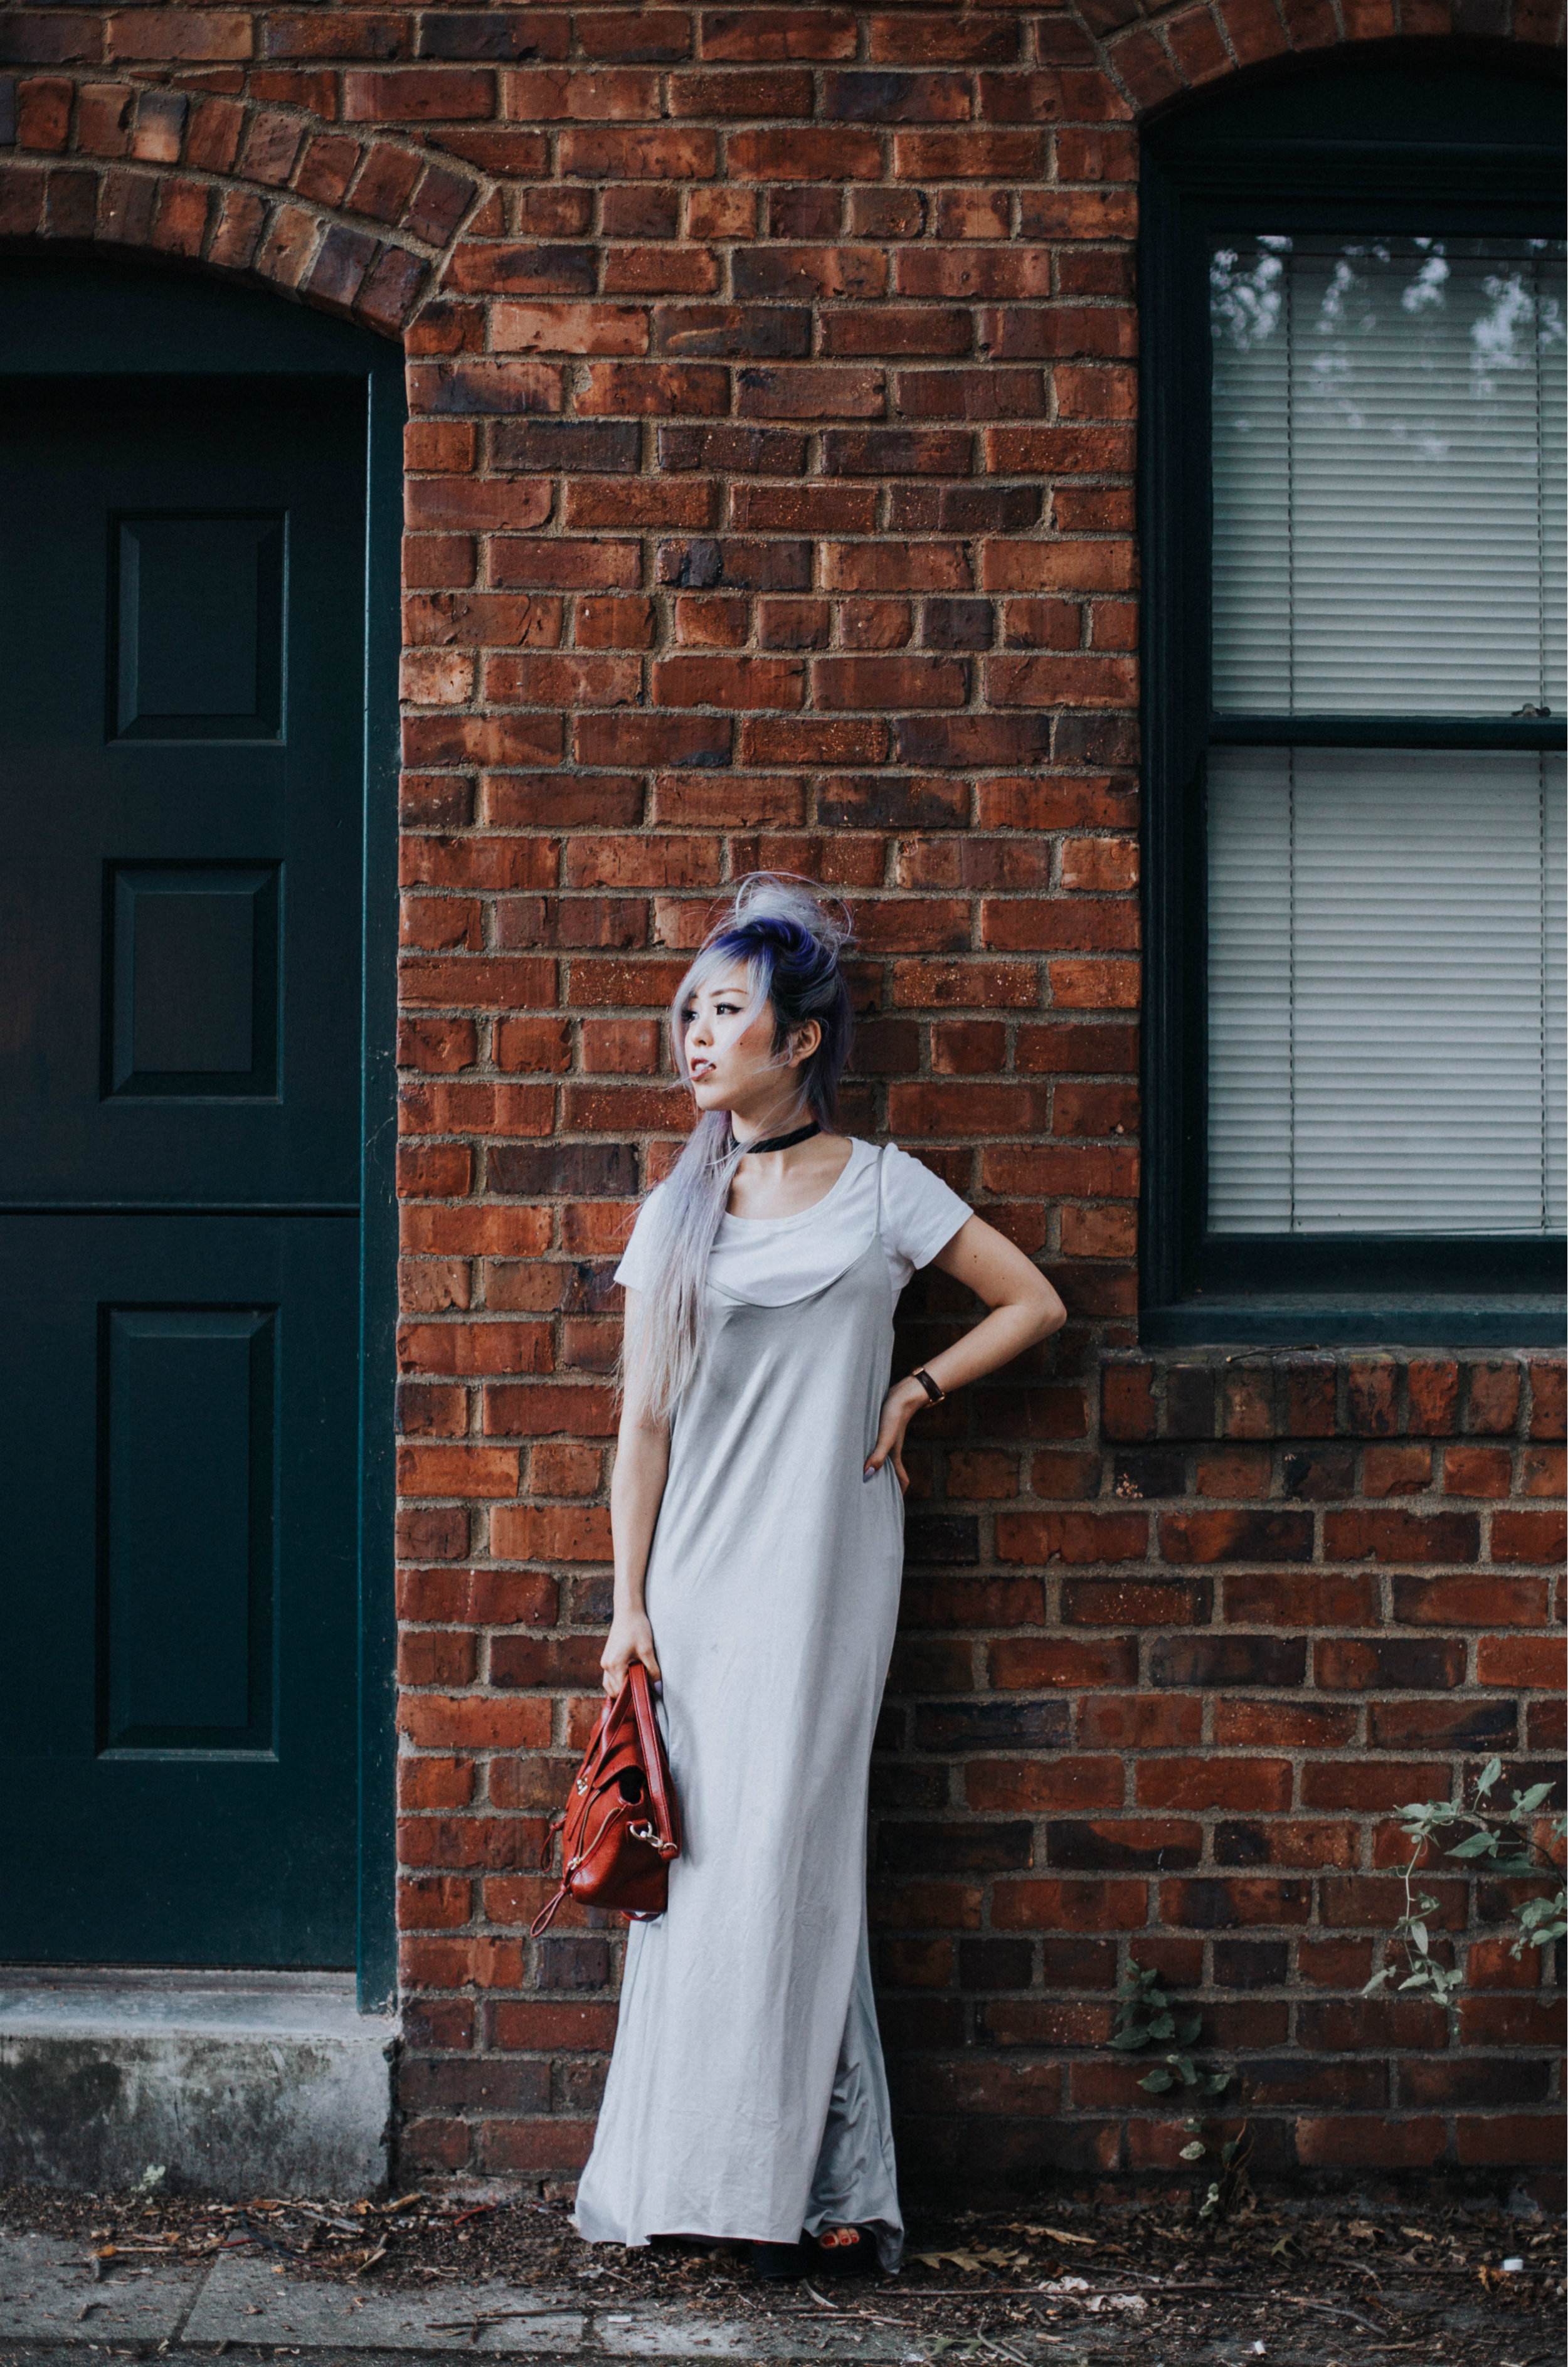 ZARA Silver Maxi Slip Dress_Missguided Black Choker_Revolve White Tee_JustFab Red Mini Bag_Topknot Hair_Mermaid Hair_Lavender Hair_Aikas Love Closet_Seattle Fashion Style Blogger from Japan